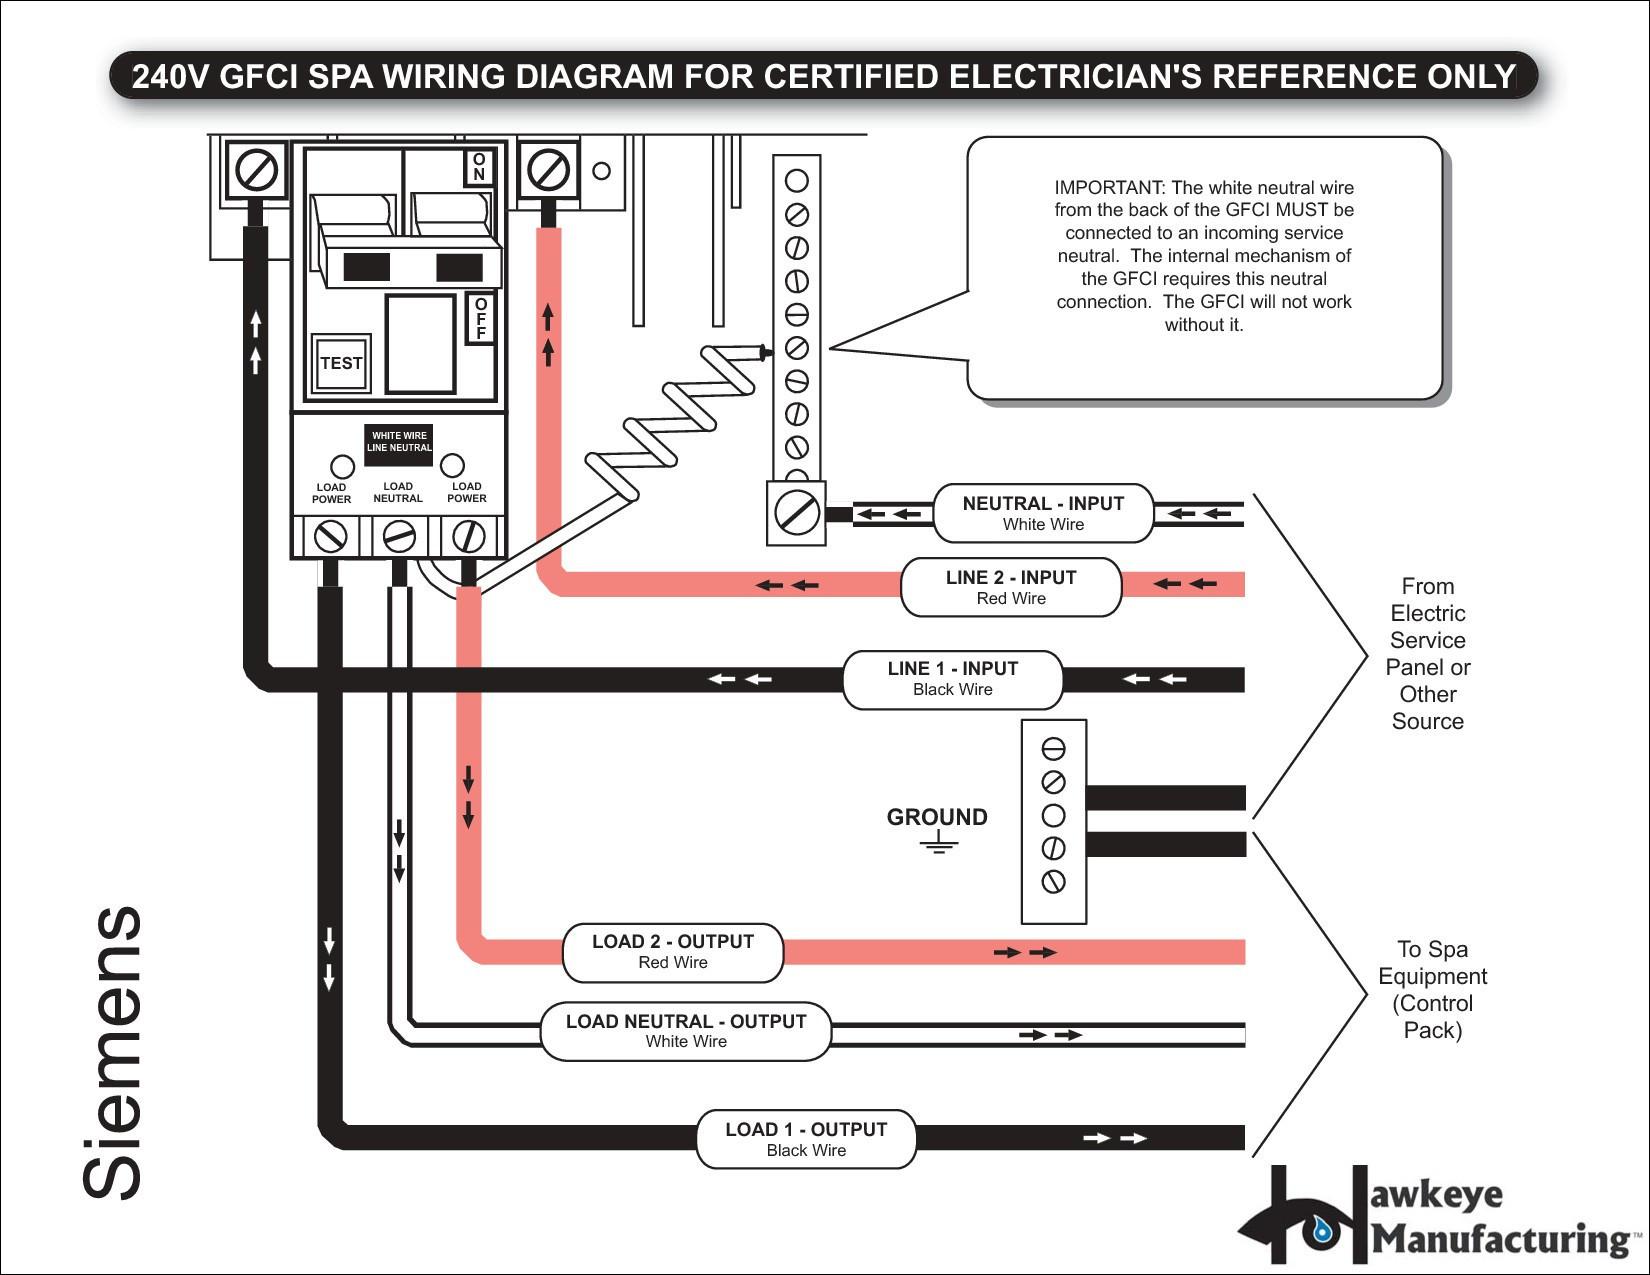 Wiring Diagram Gfci Breaker Example Of Wiring Diagram Gfci Outlet - 2 Pole Gfci Breaker Wiring Diagram